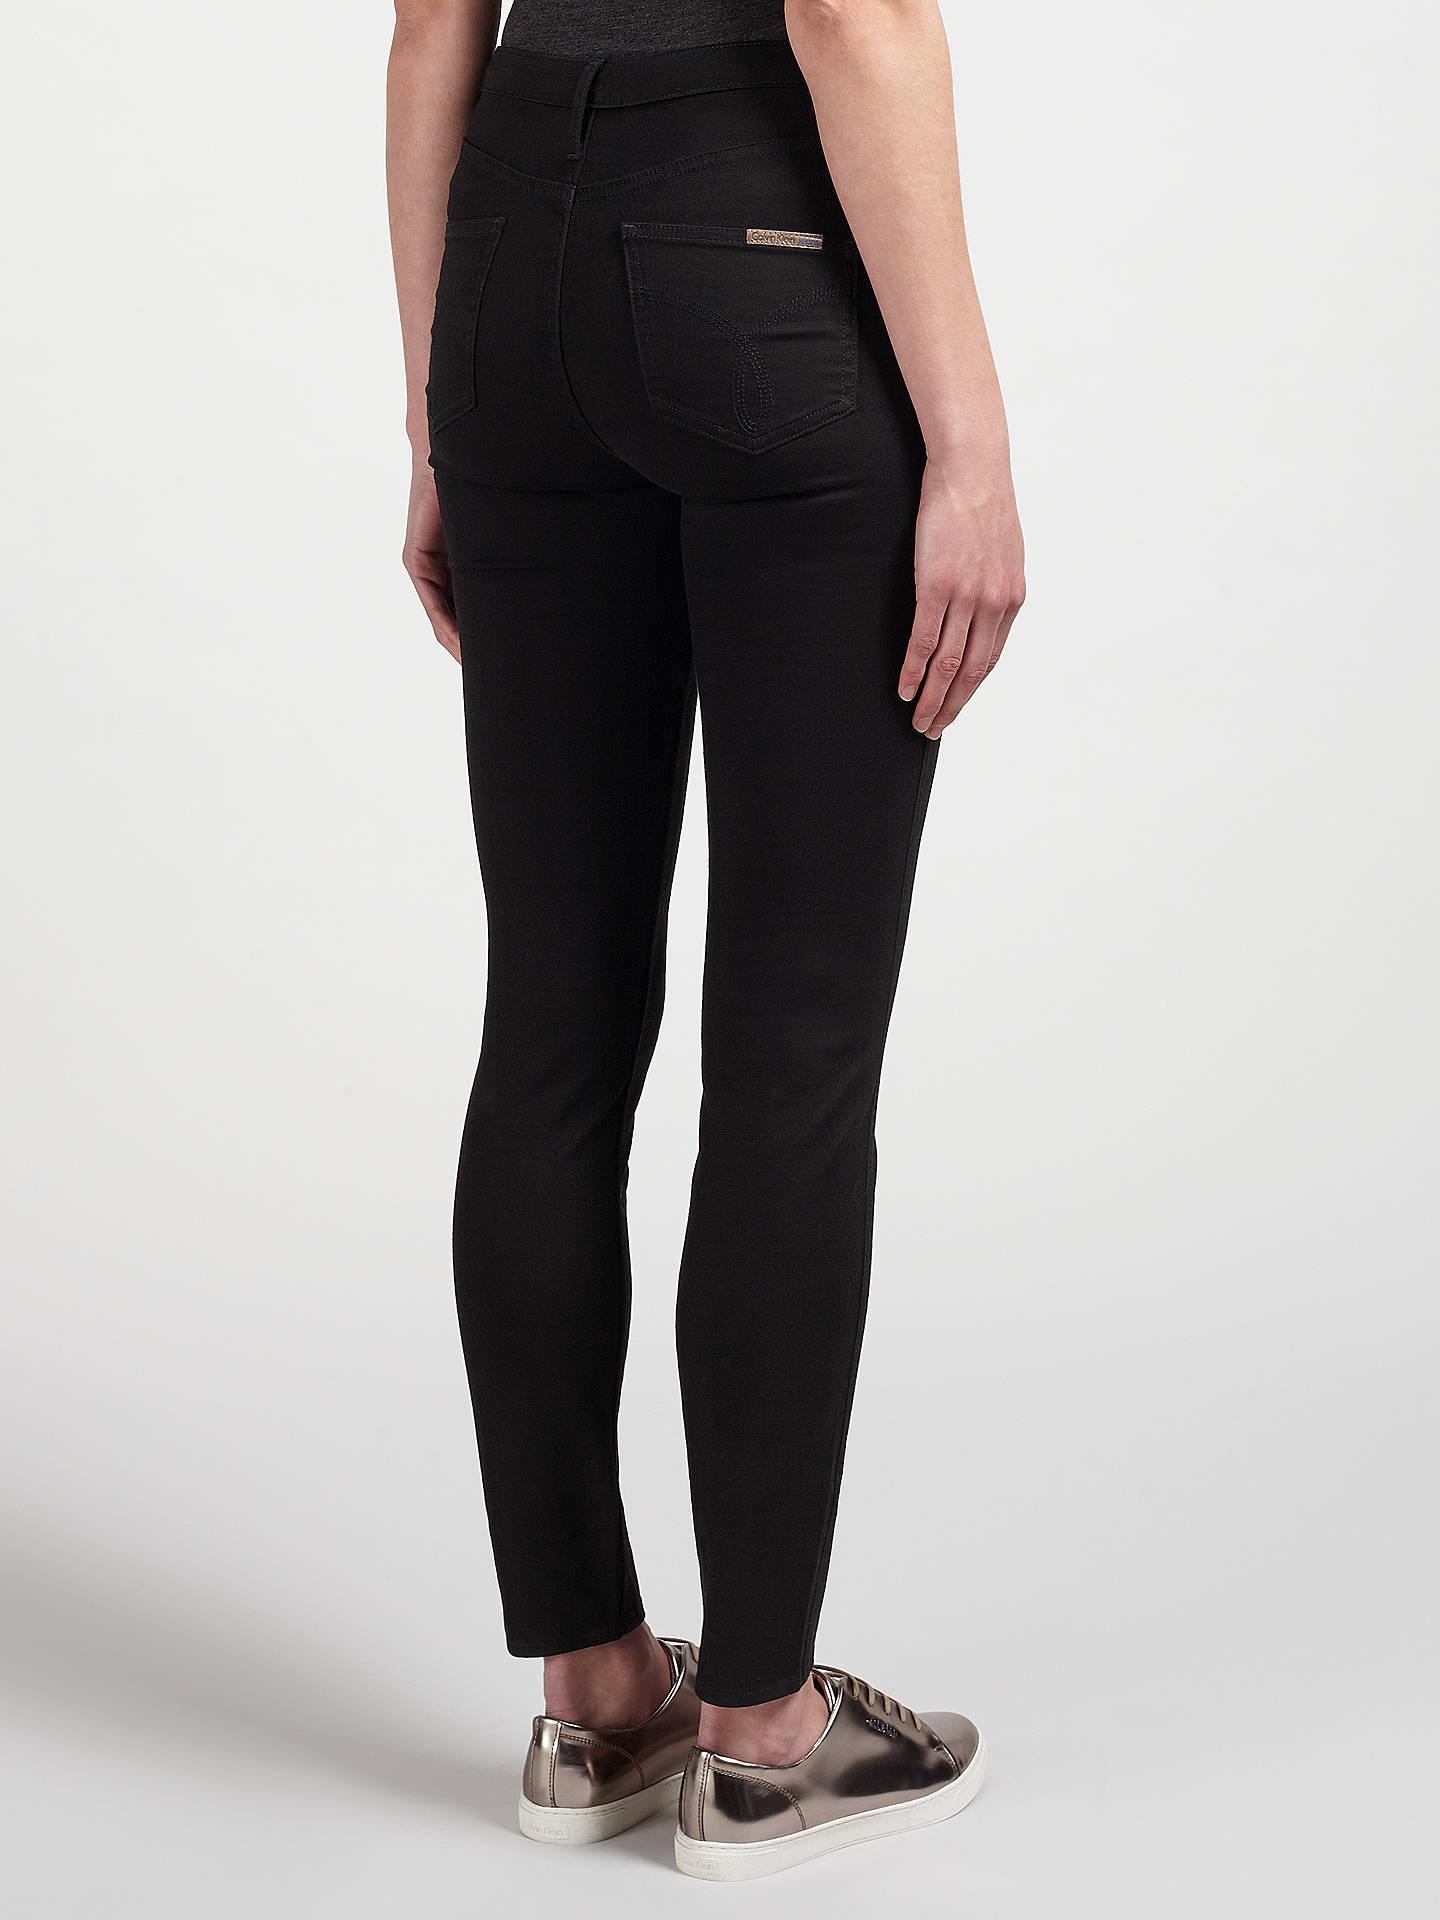 Buy Calvin Klein Jeans Black Stretch